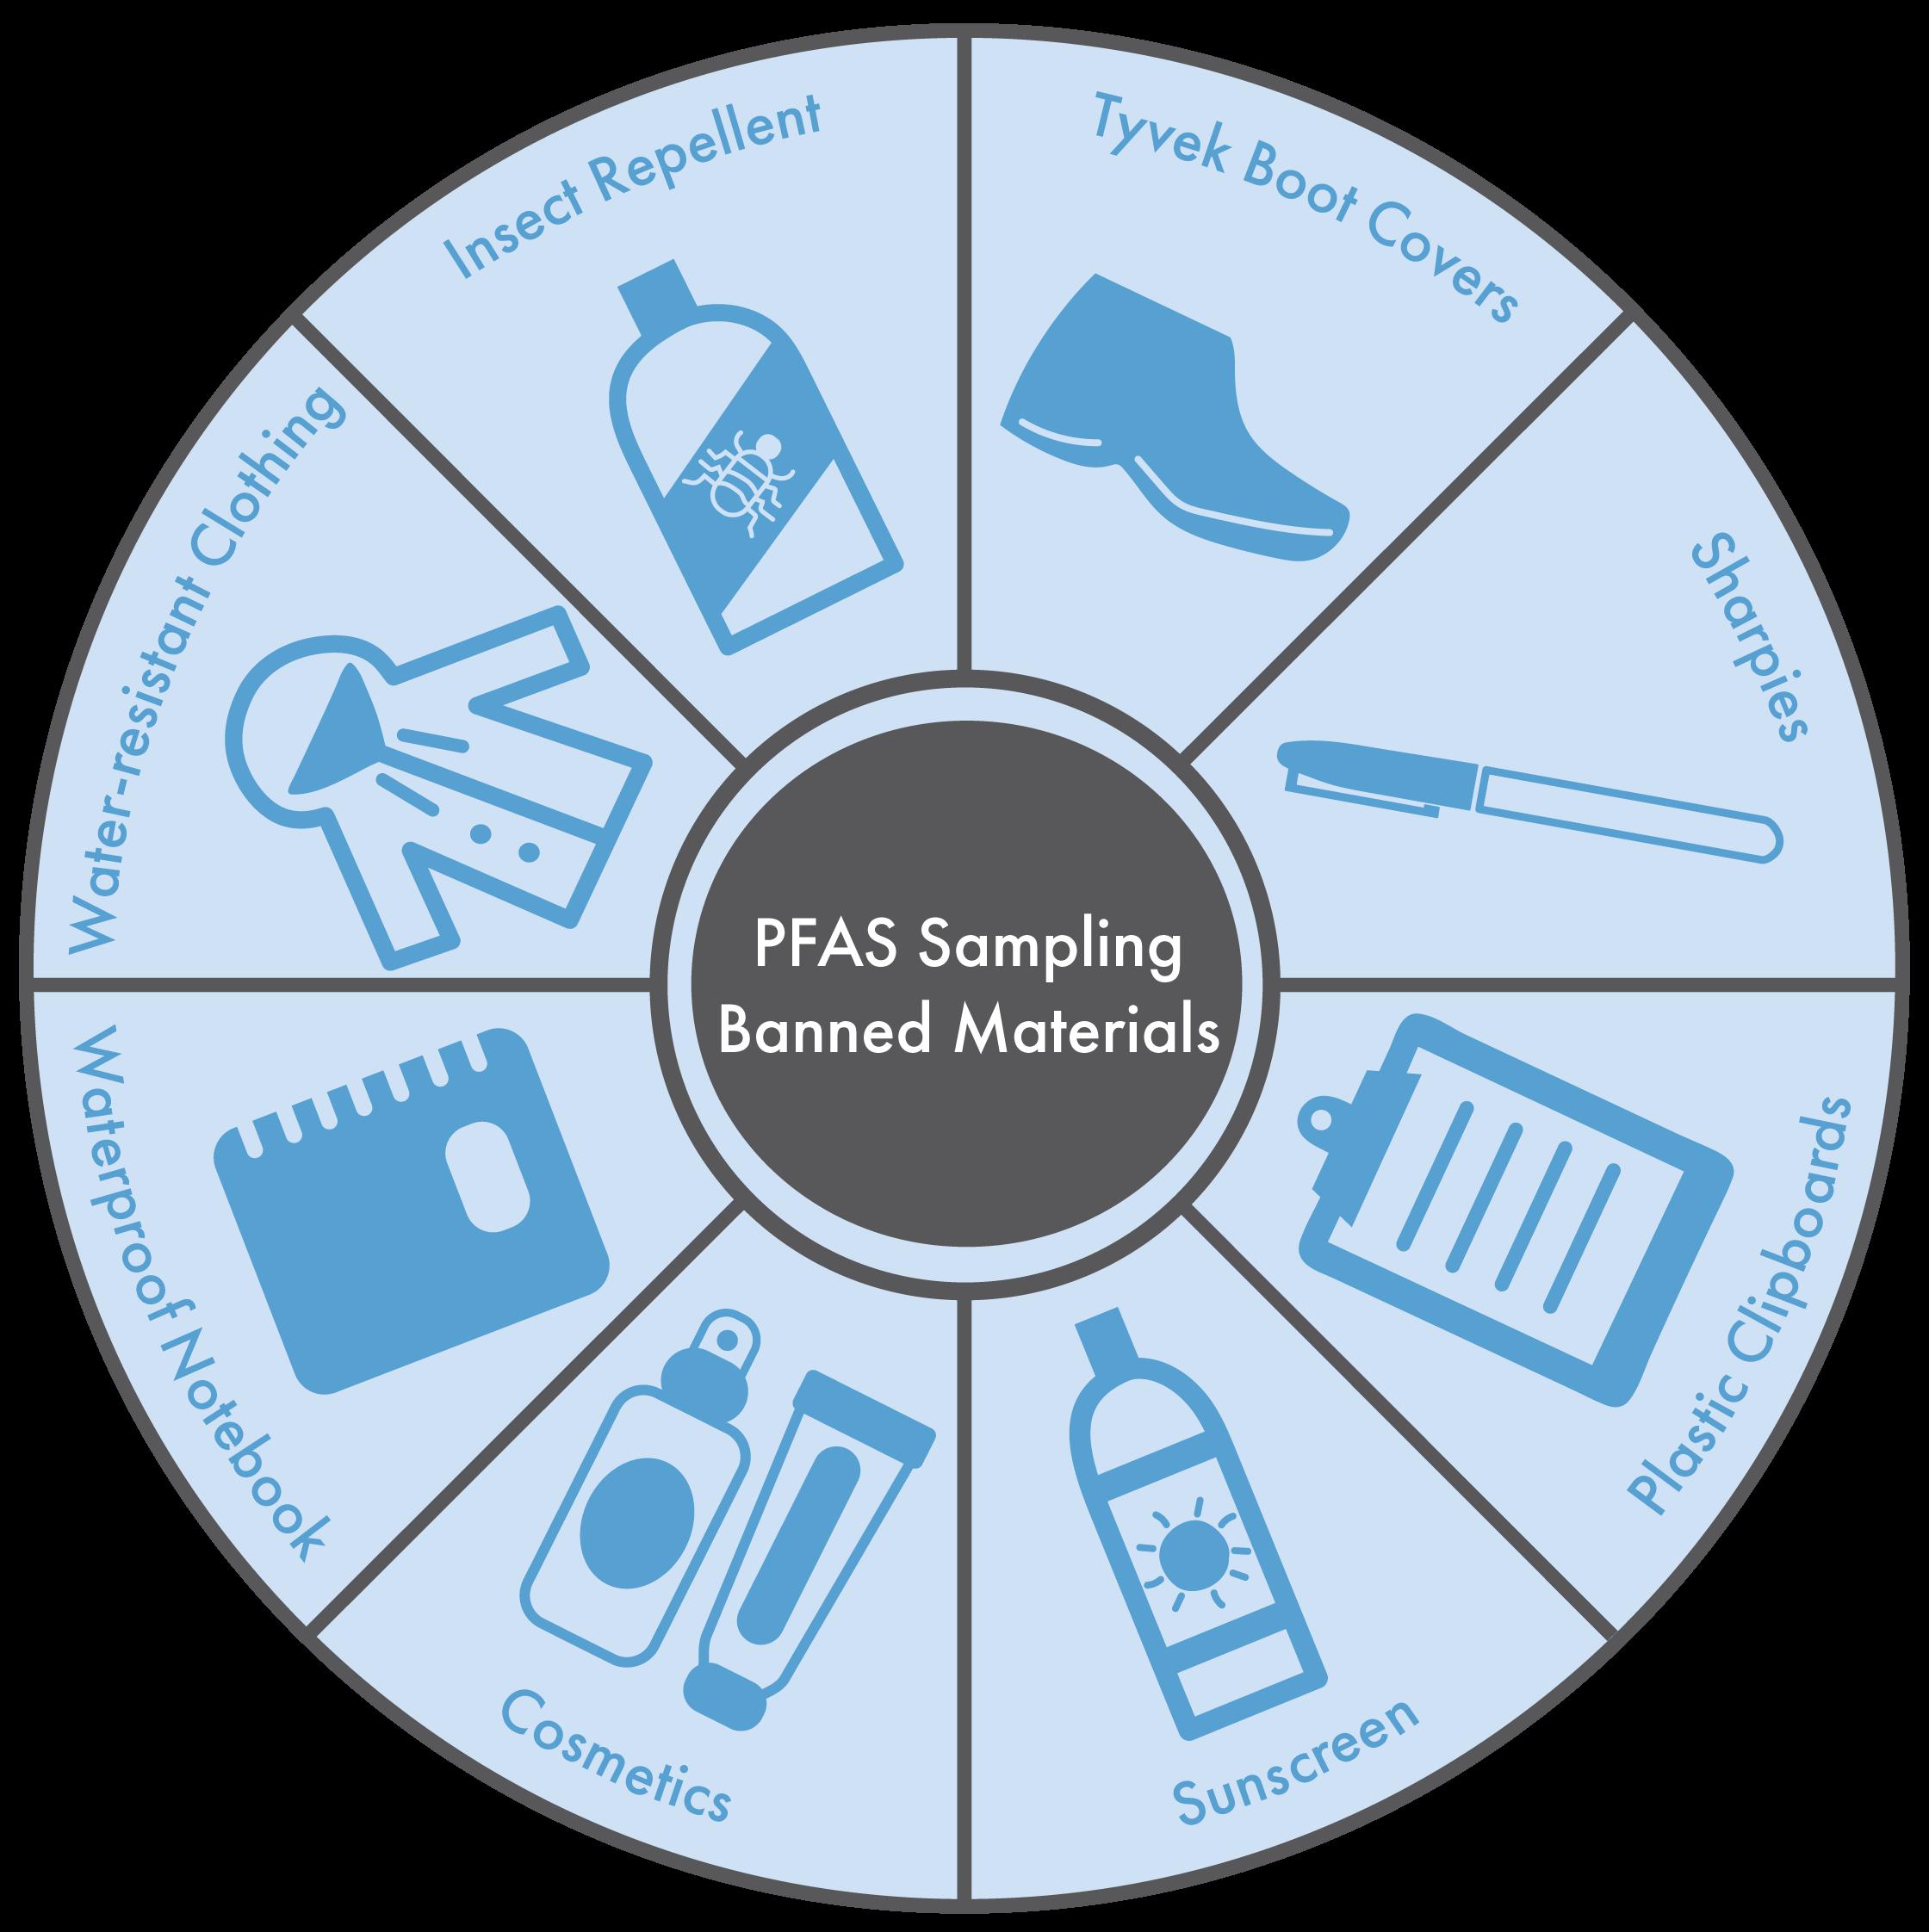 Sampling for PFAS Requires Caution - LimnoTech